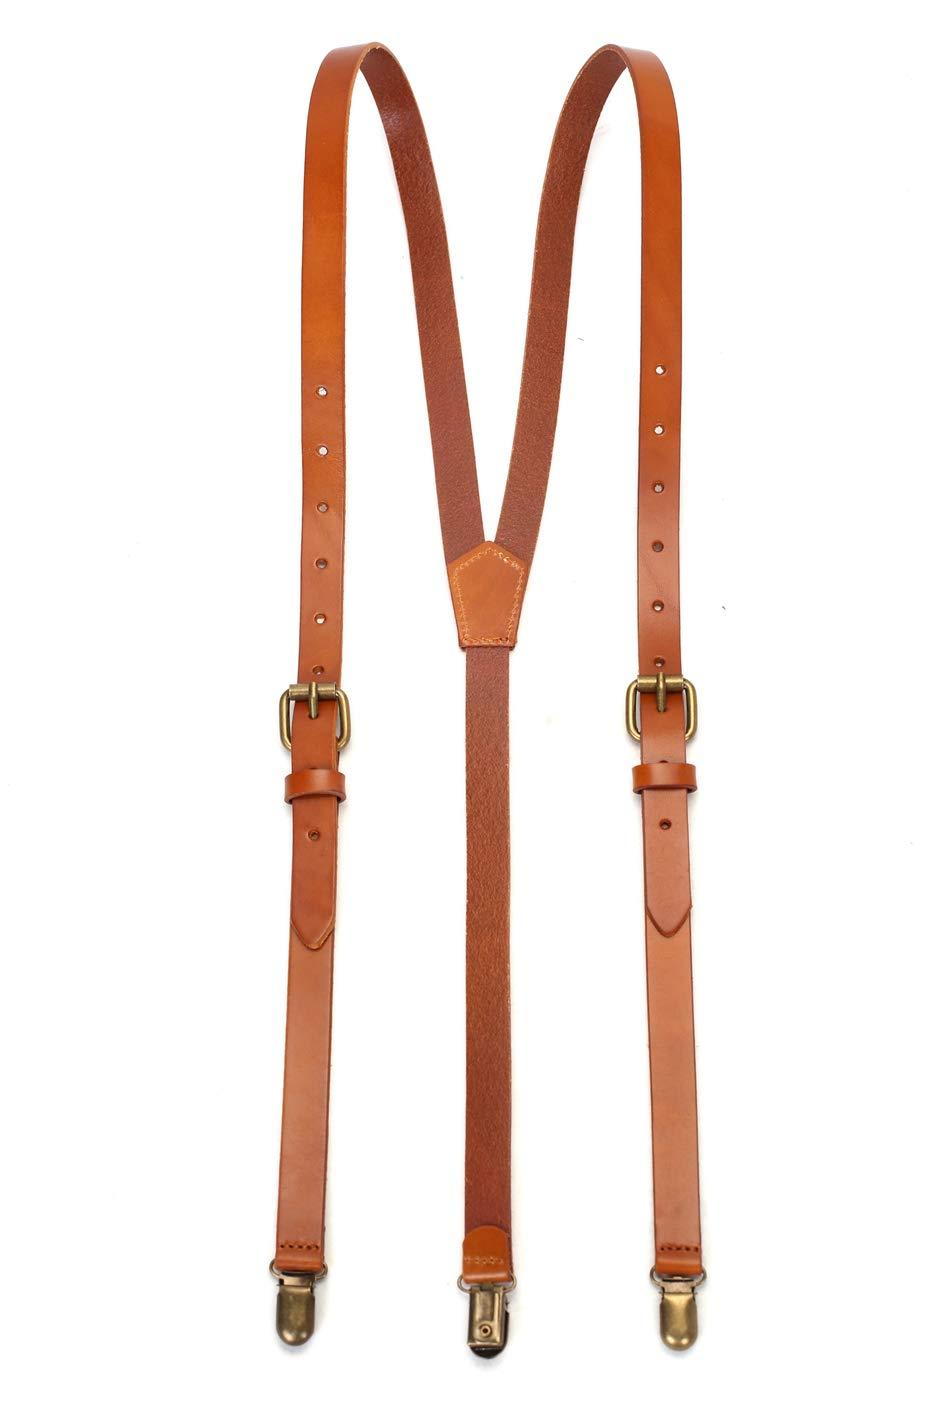 ROCKCOW Genuine Leather Suspenders/Groomsman Wedding Suspenders for Wedding & Party